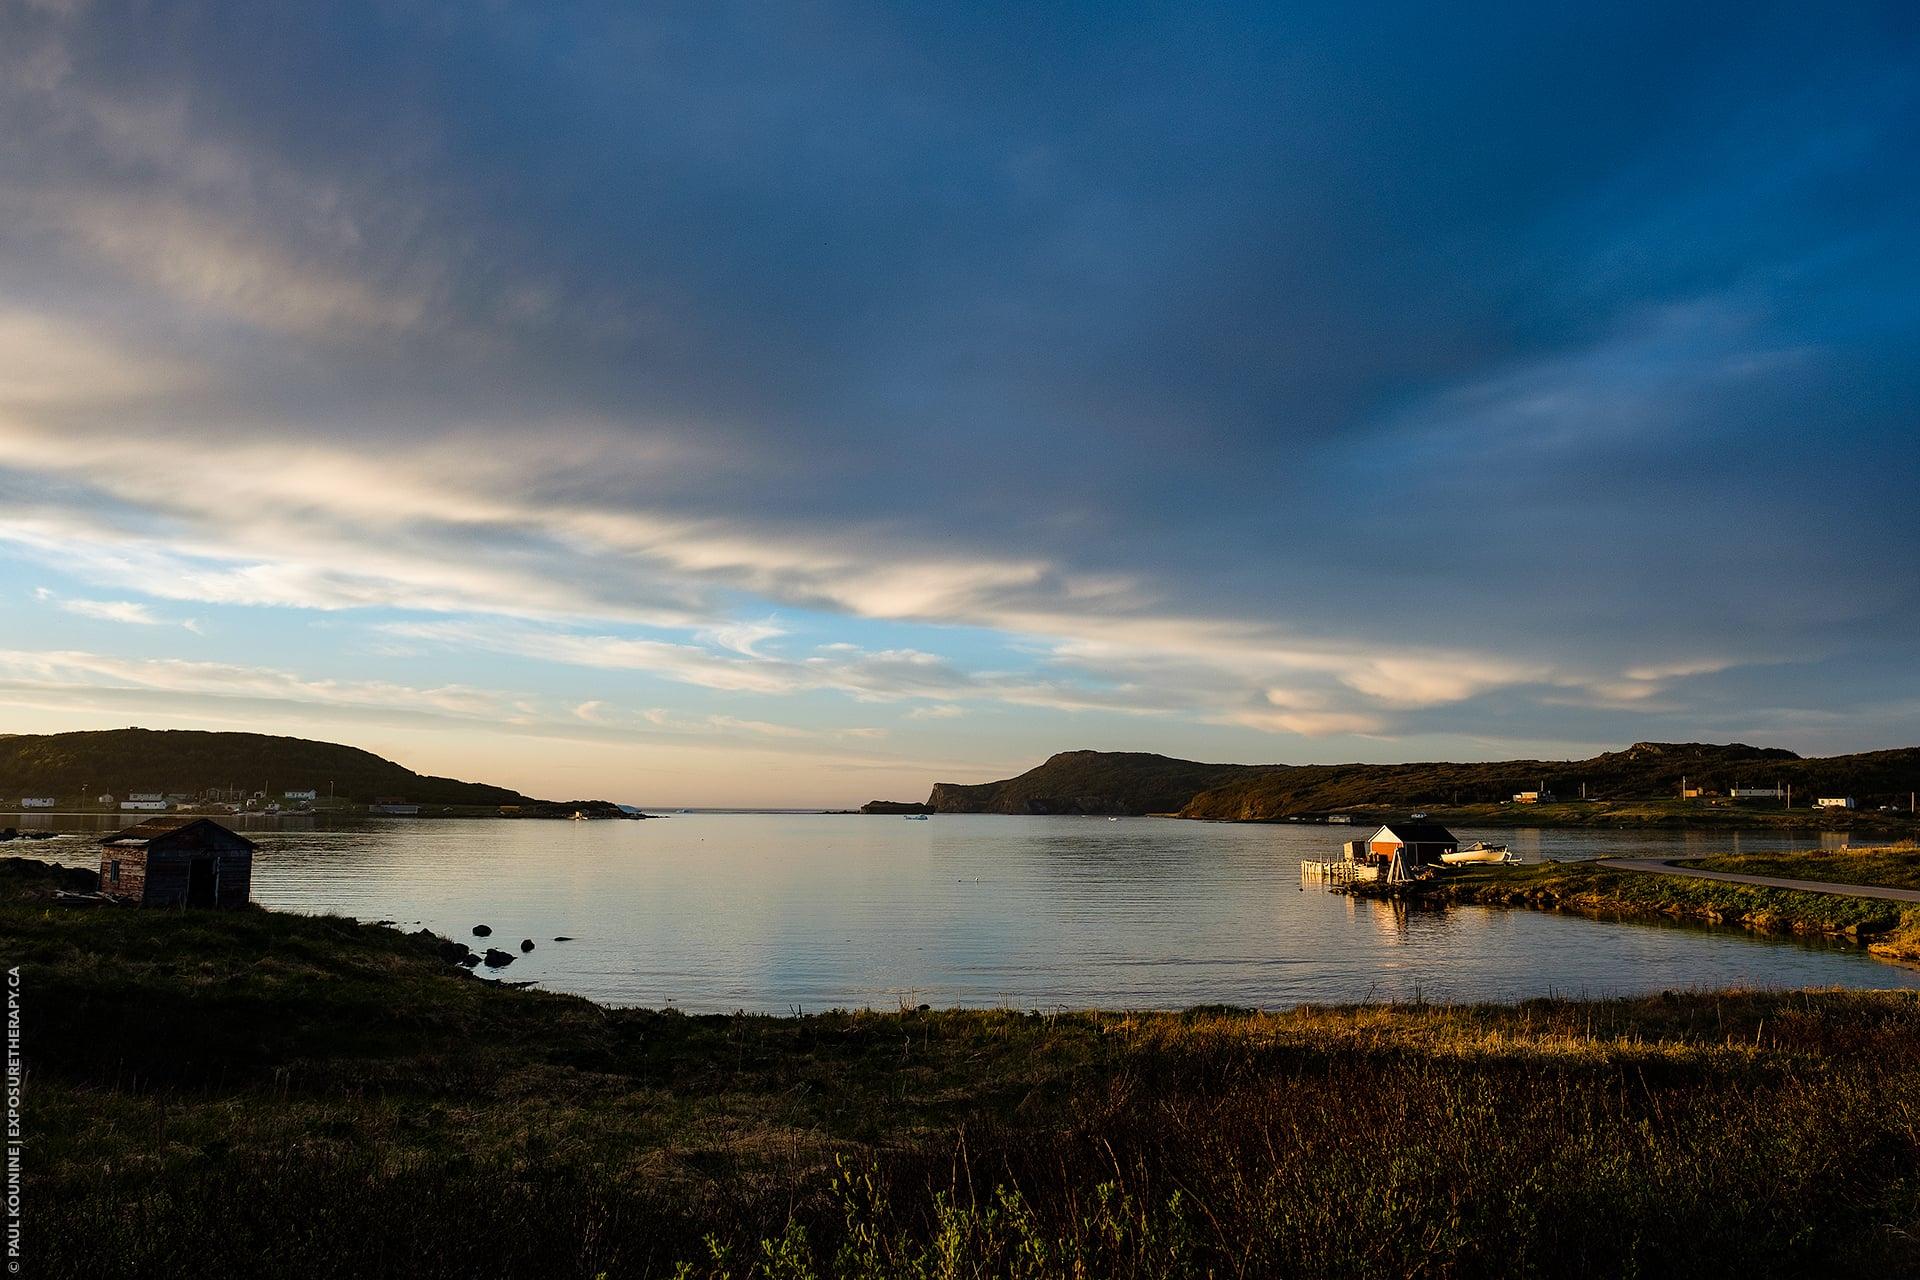 16 mm super wide-angle lens on APS-C camera, north Newfoundland bay.